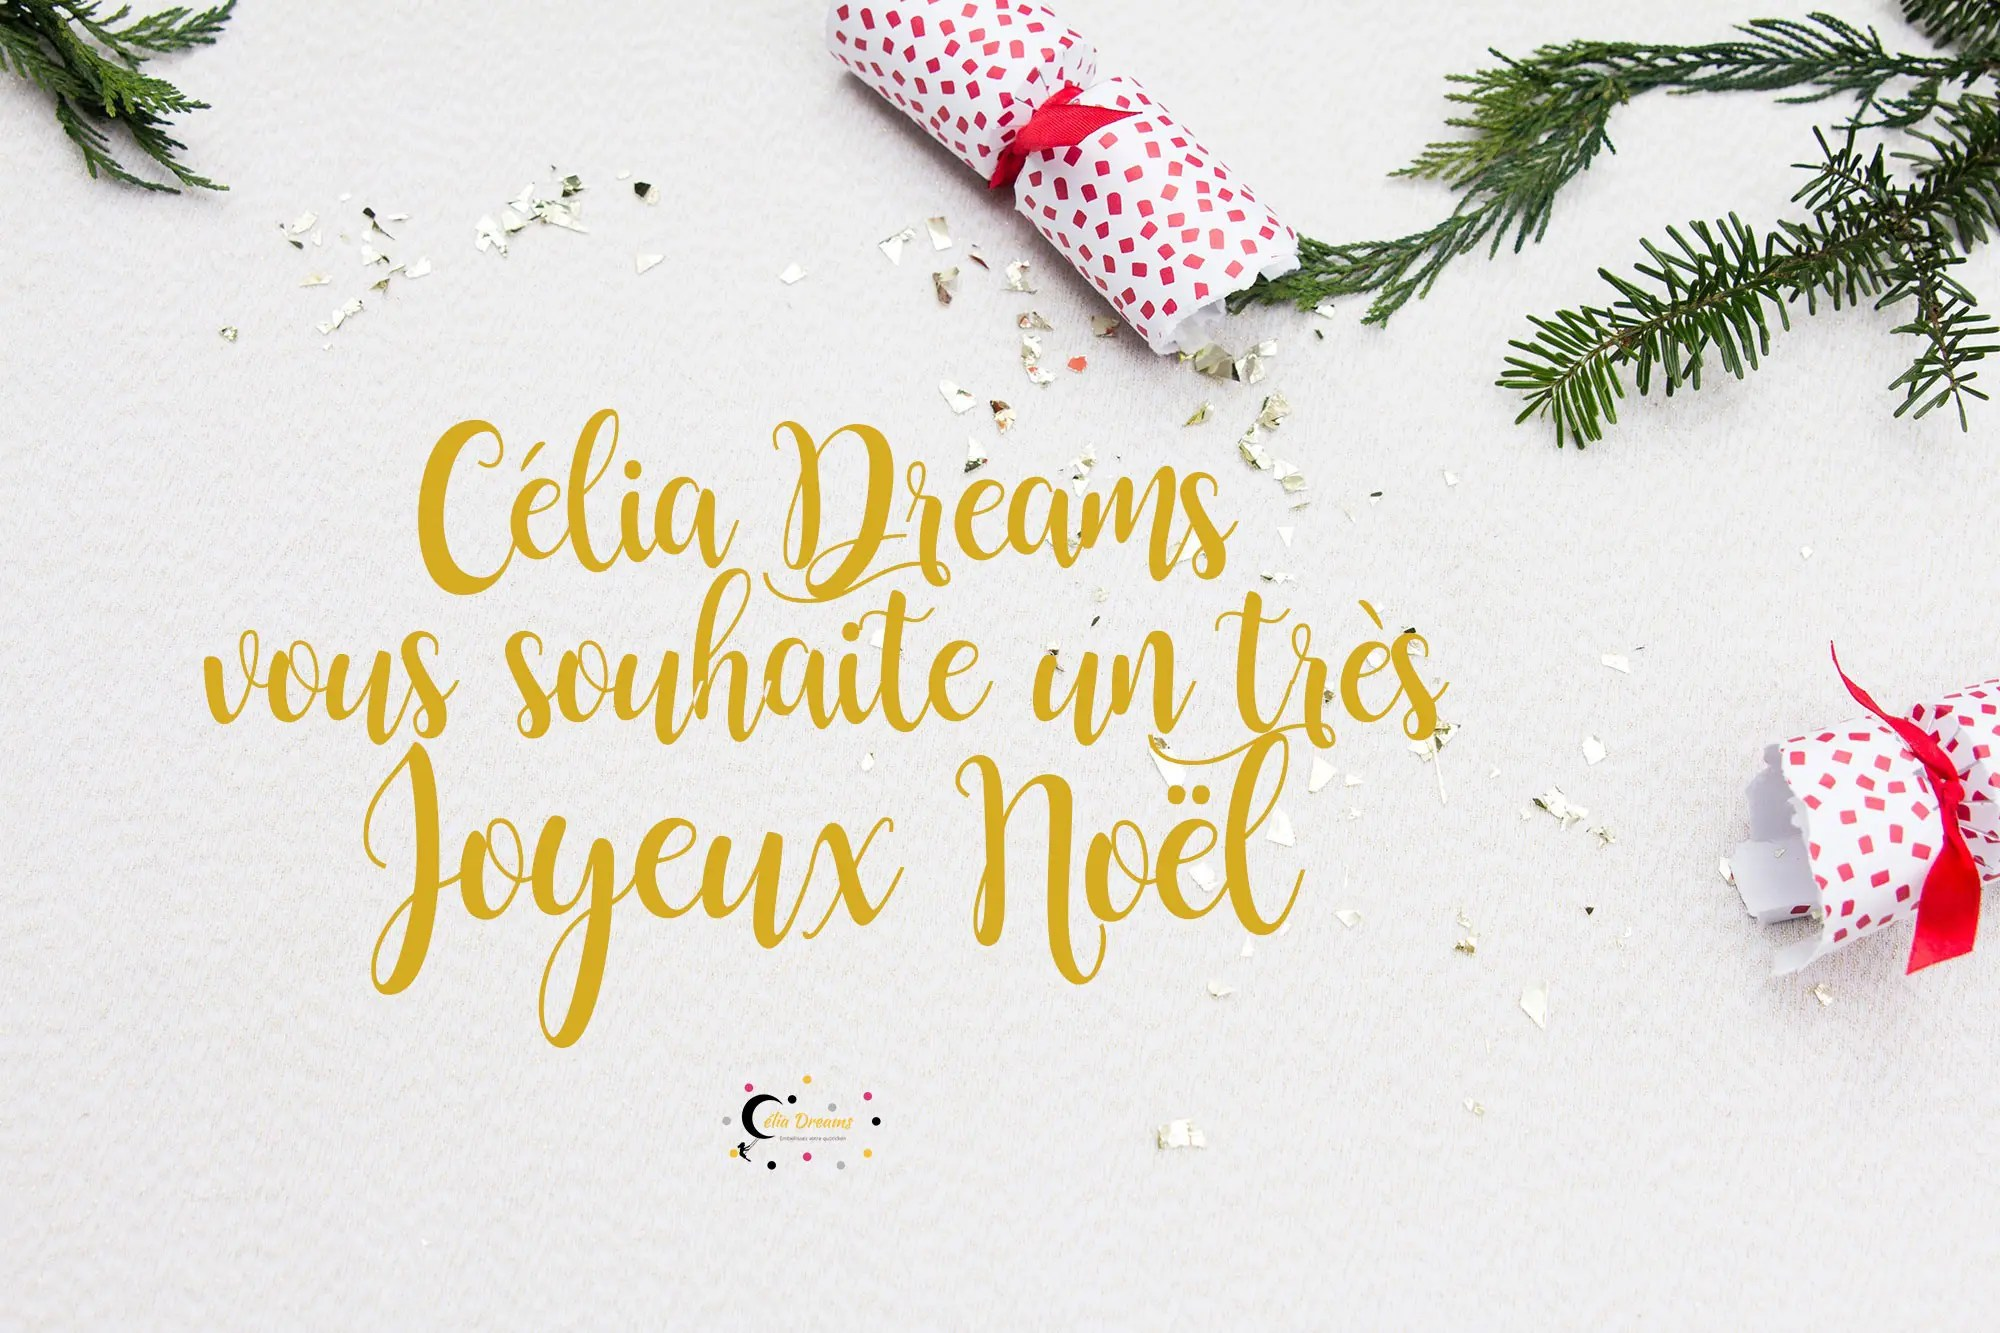 celiadreams-joyeux-noel-christmas